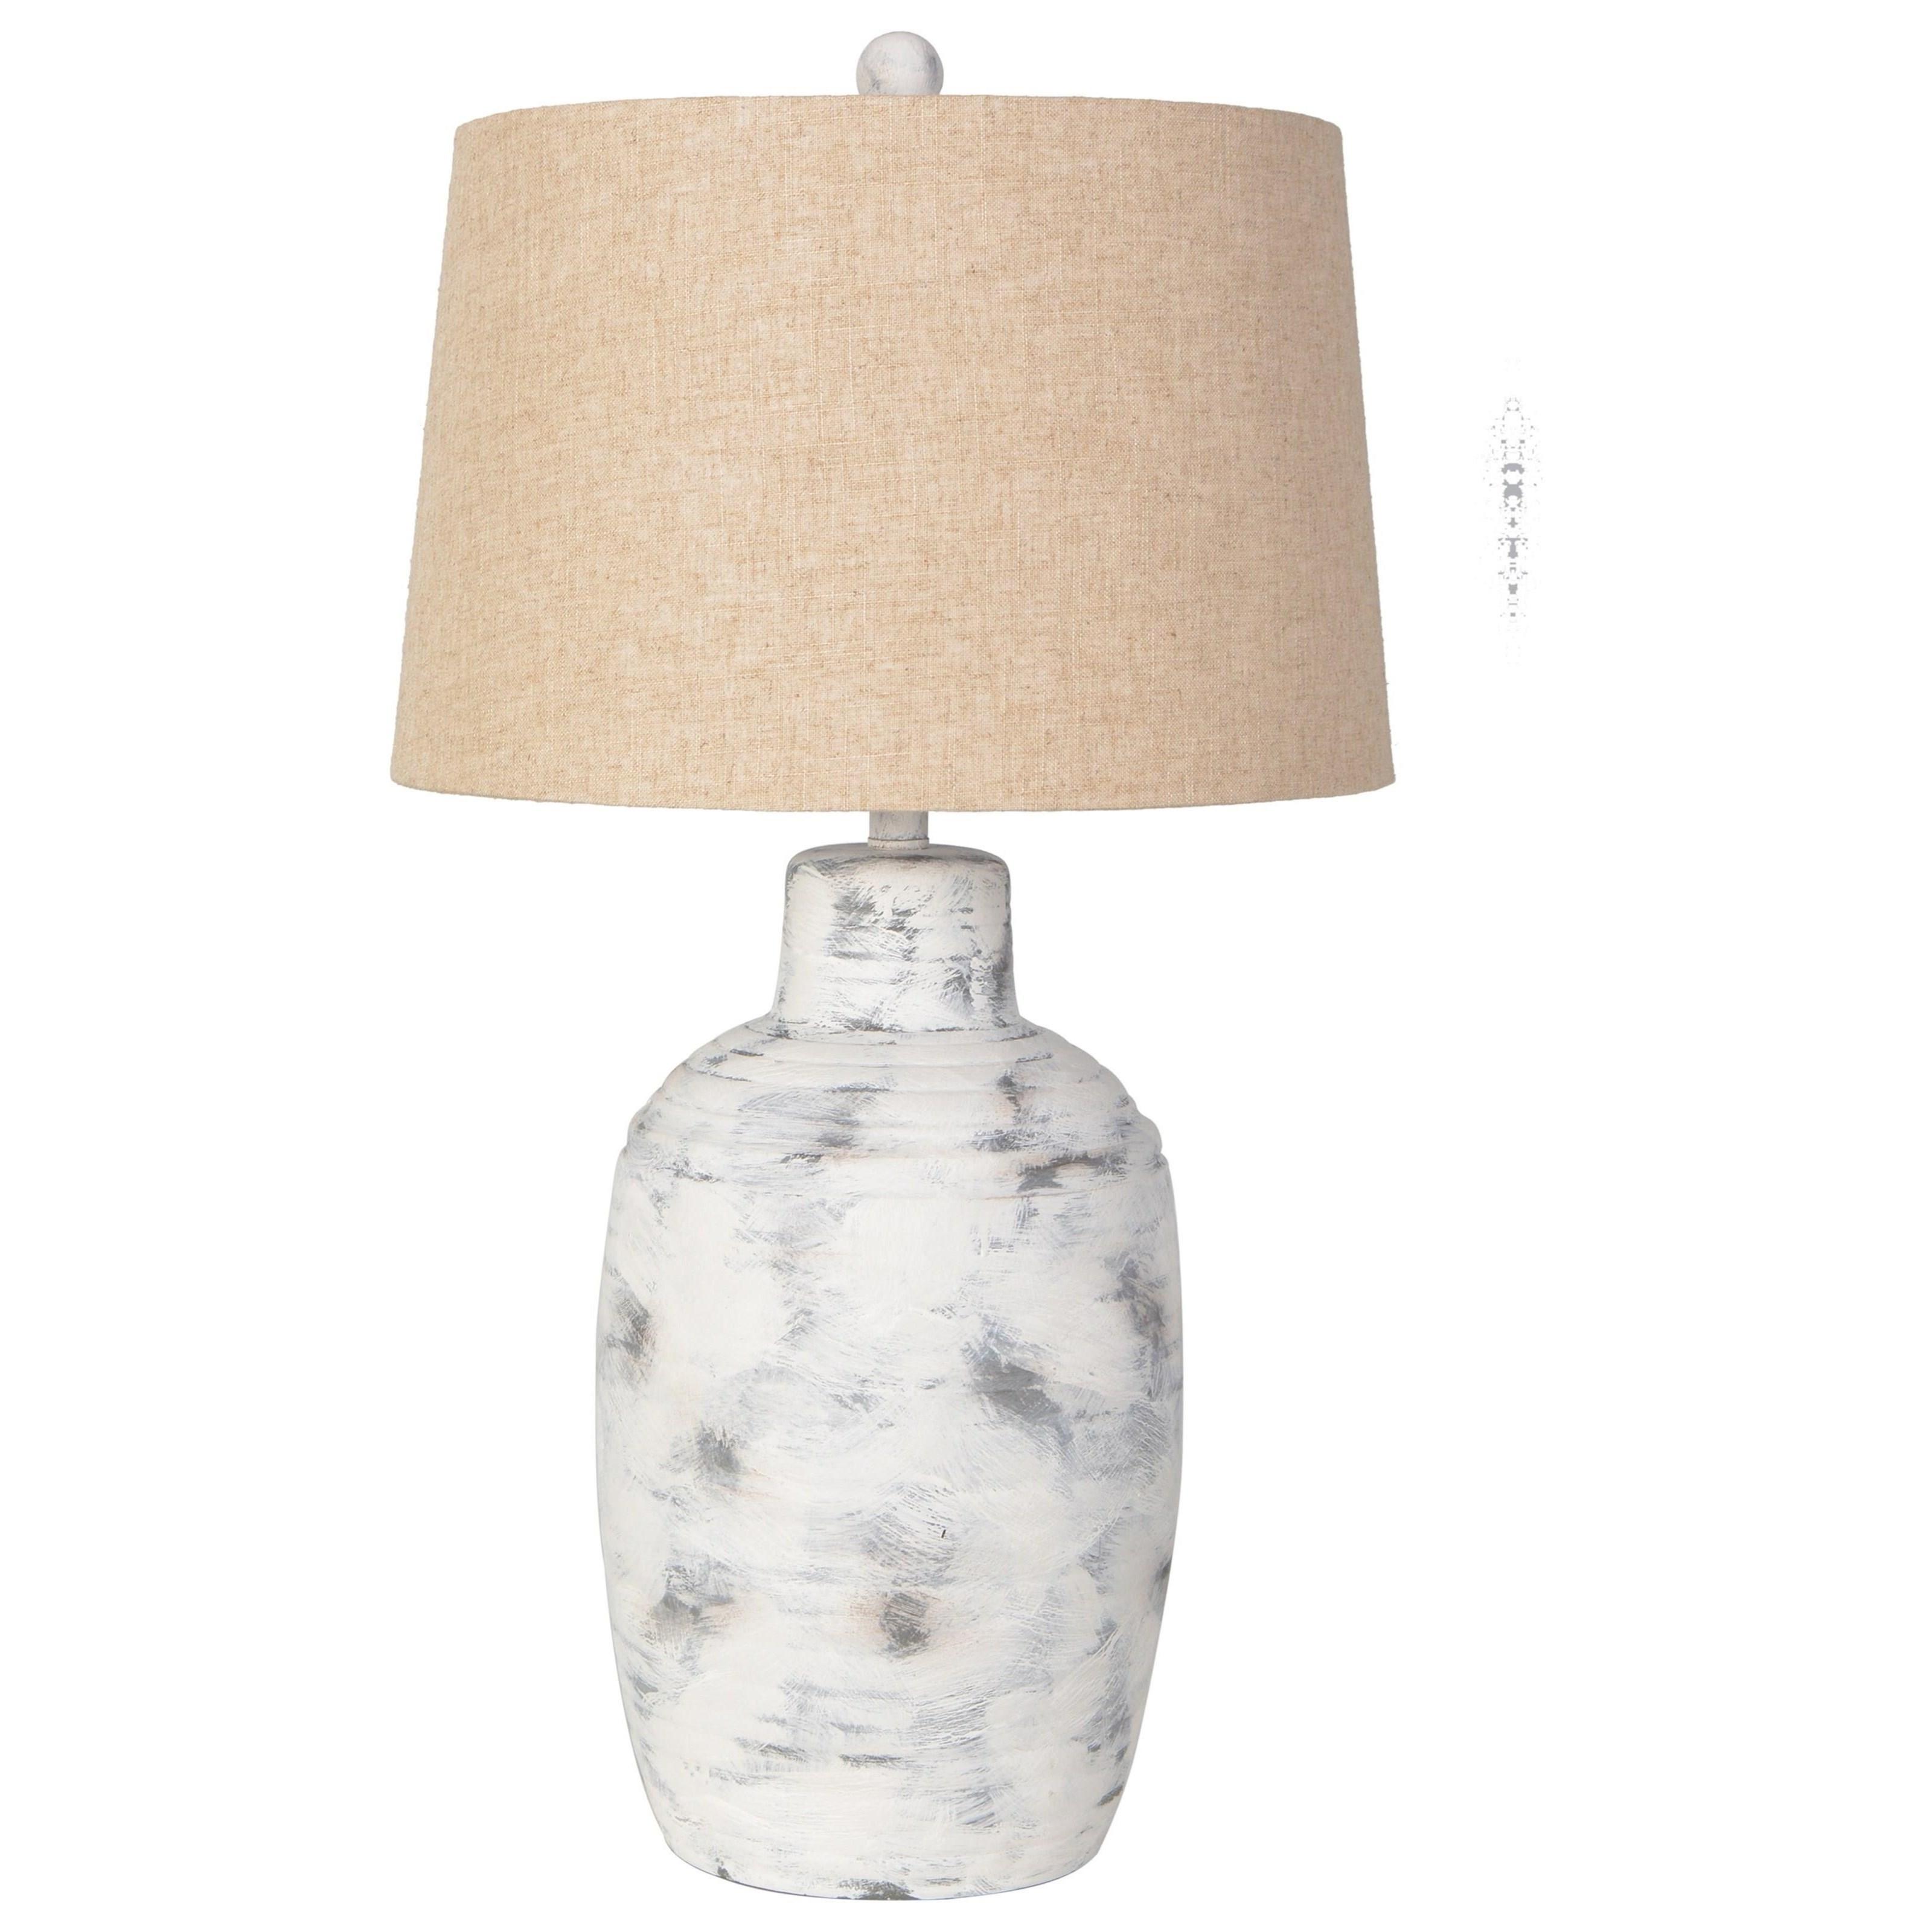 Lamps Per Se Lamps Polyresin Table Lamp - Item Number: LPS-208